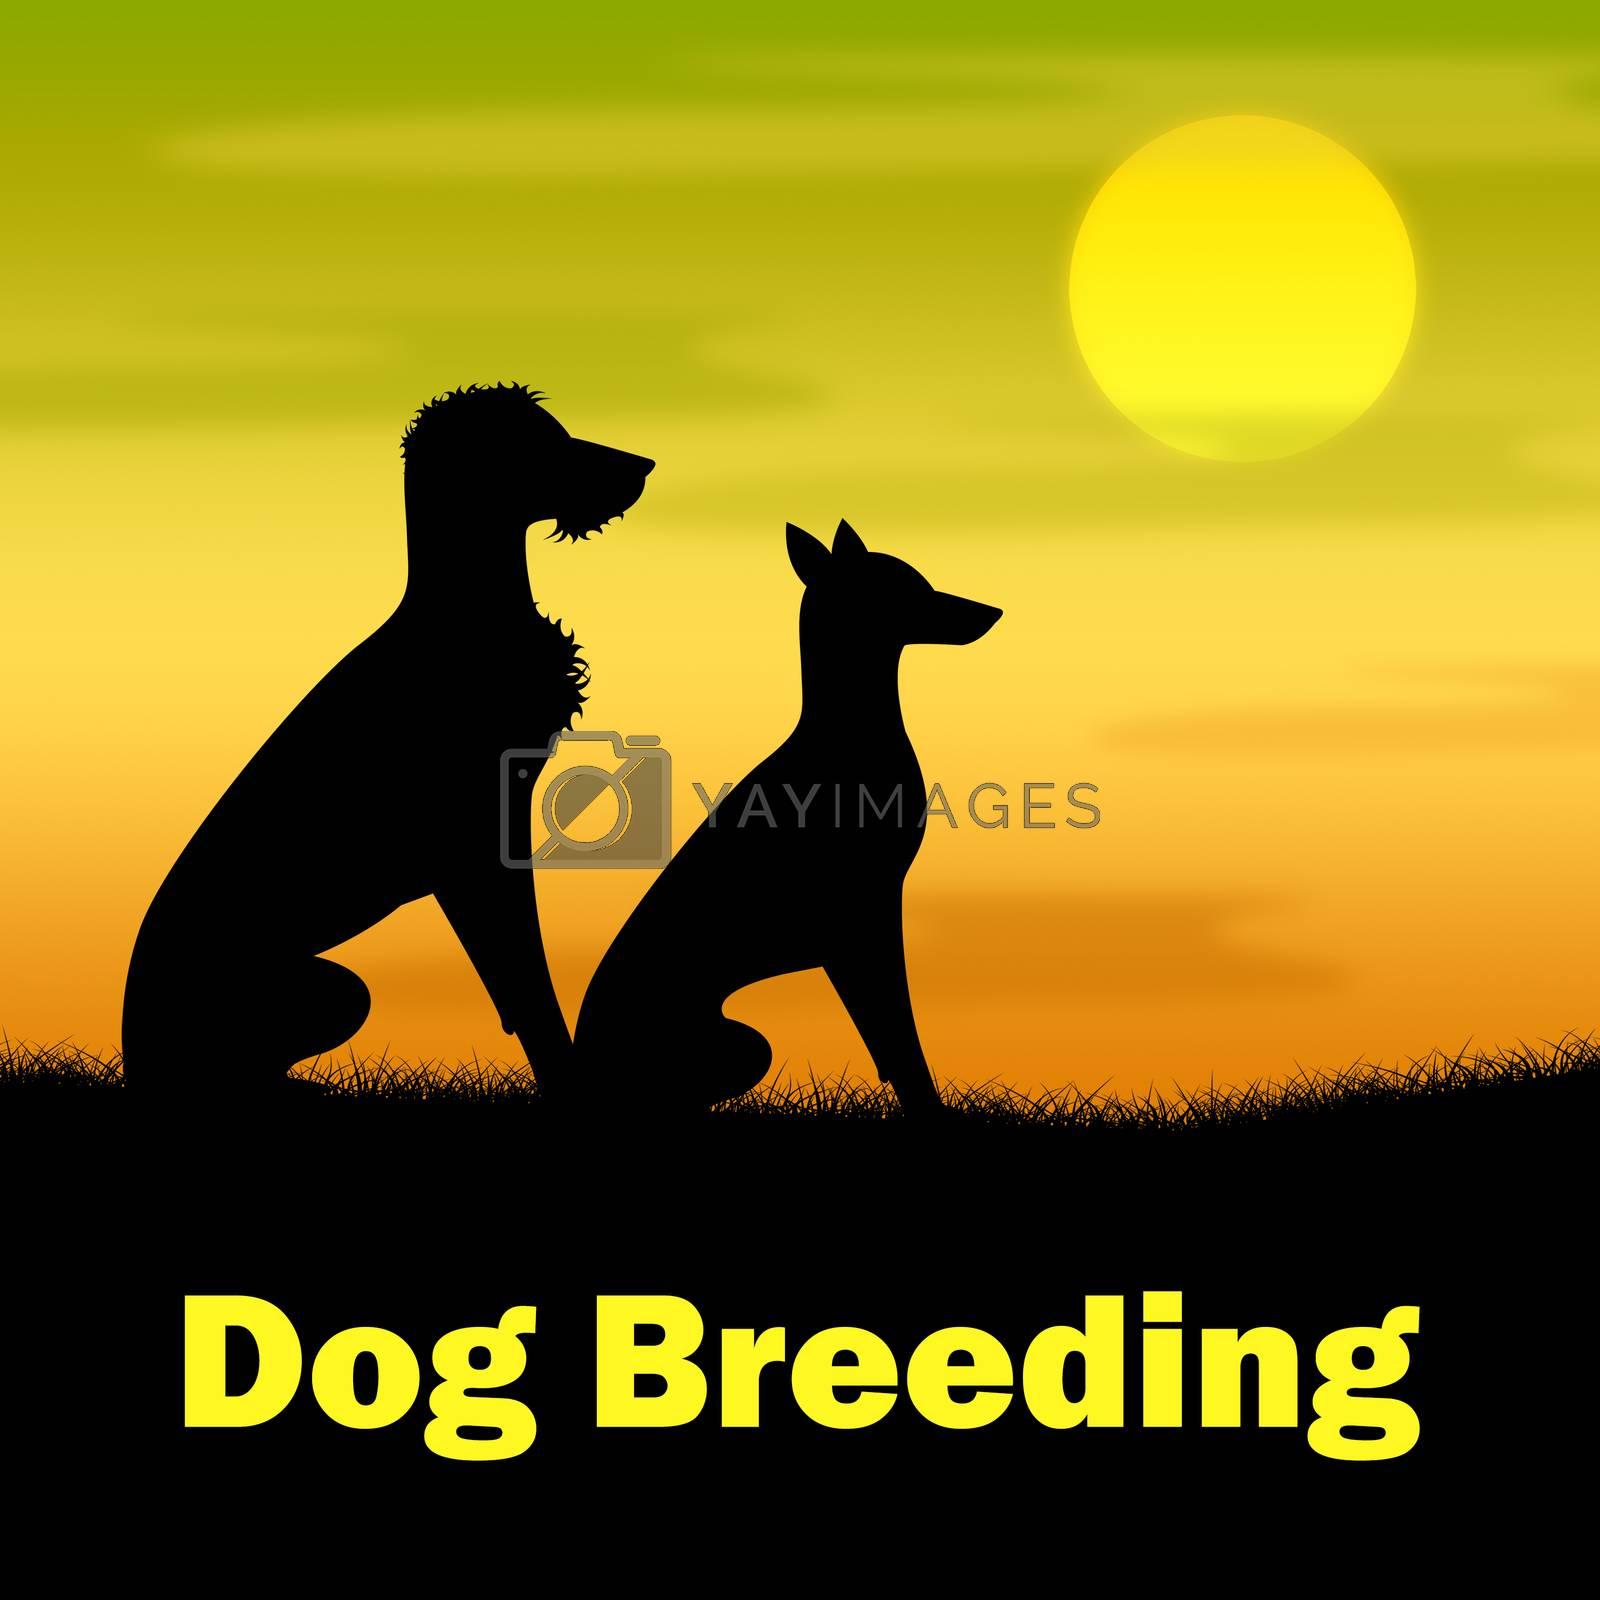 Dog Breeding Representing Offspring Canine And Night